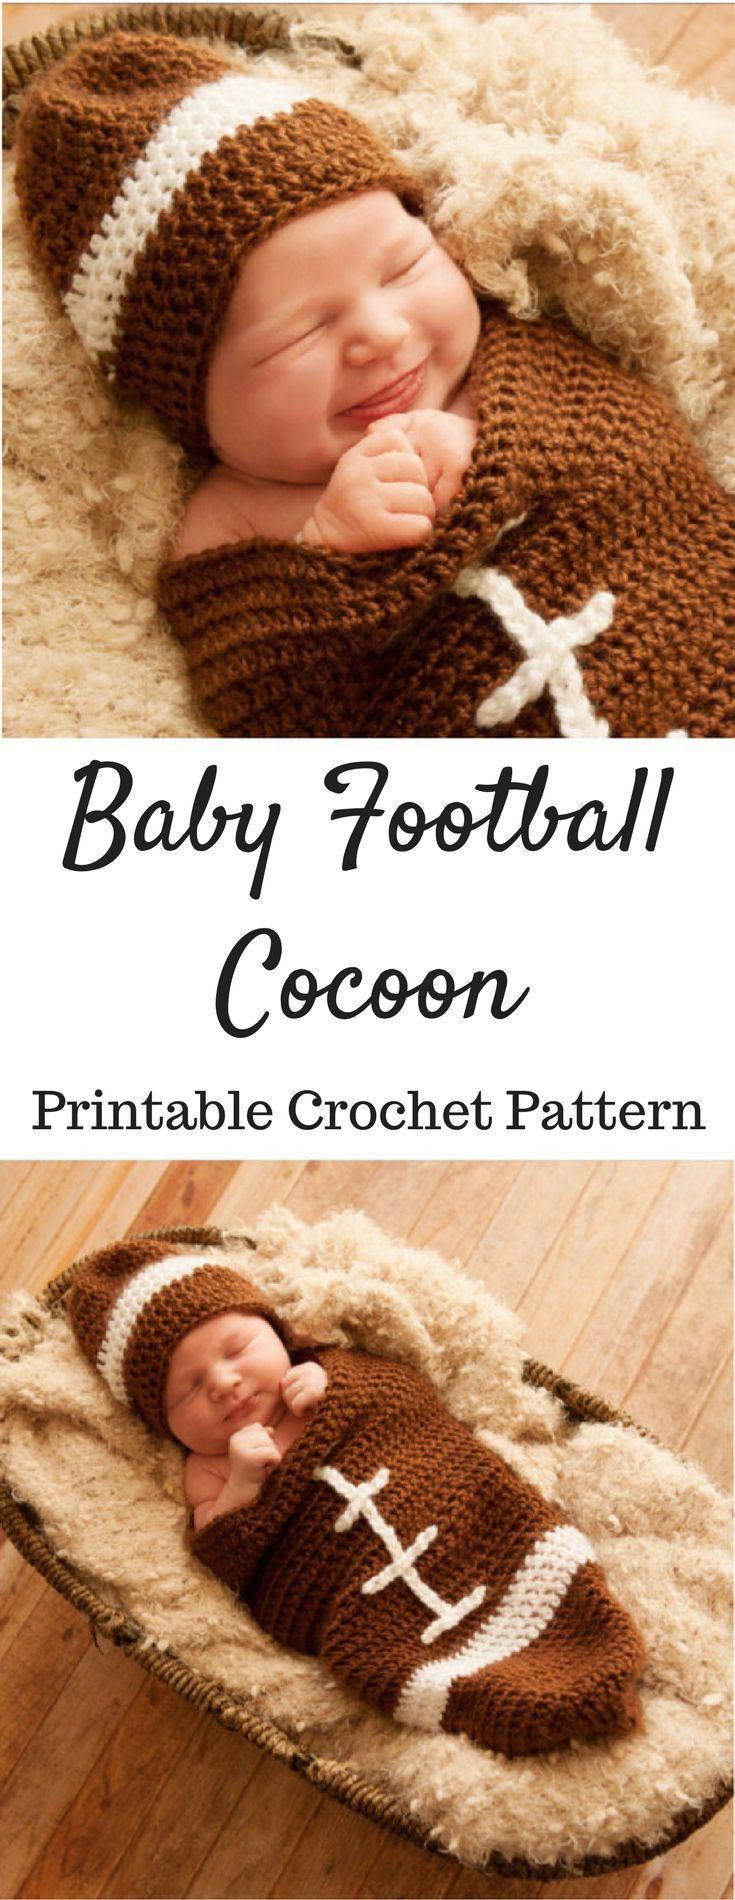 Baby Football Cocoon Crochet Pattern Printable PDF | Newborn ...